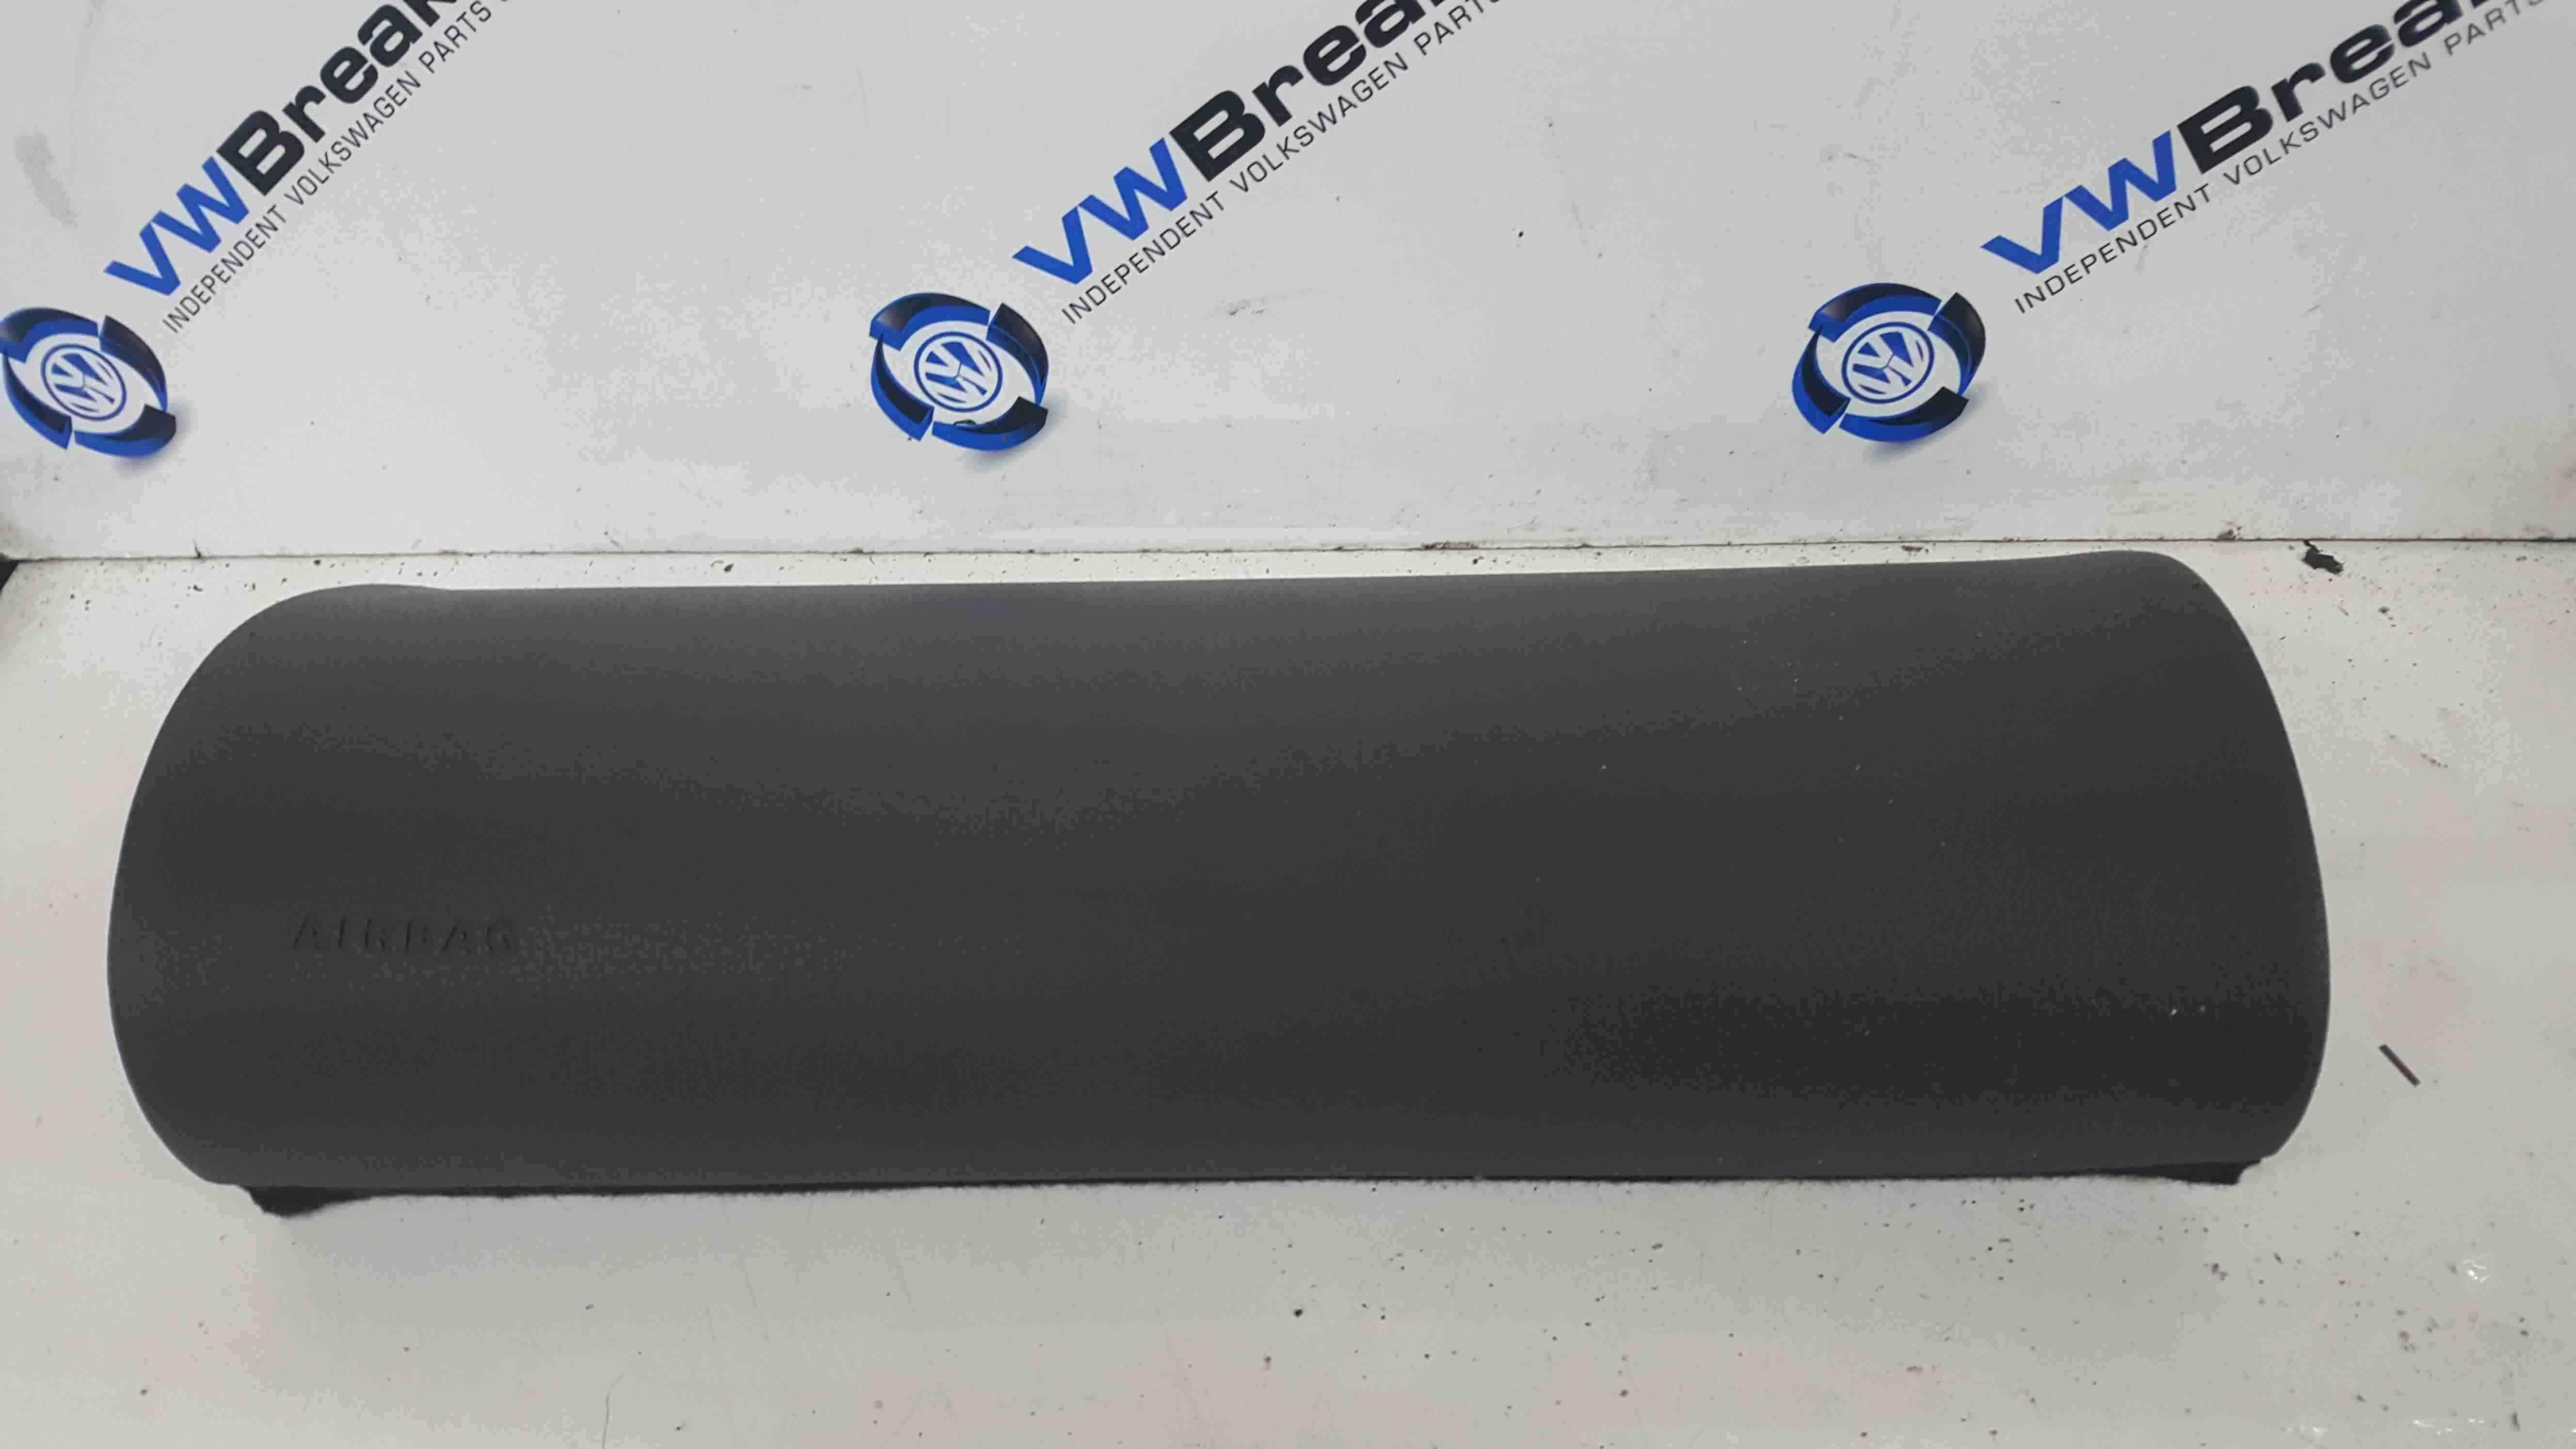 Volkswagen Passat B5.5 2001-2005 Passenger Front Dash Cover Trim 3B2880261